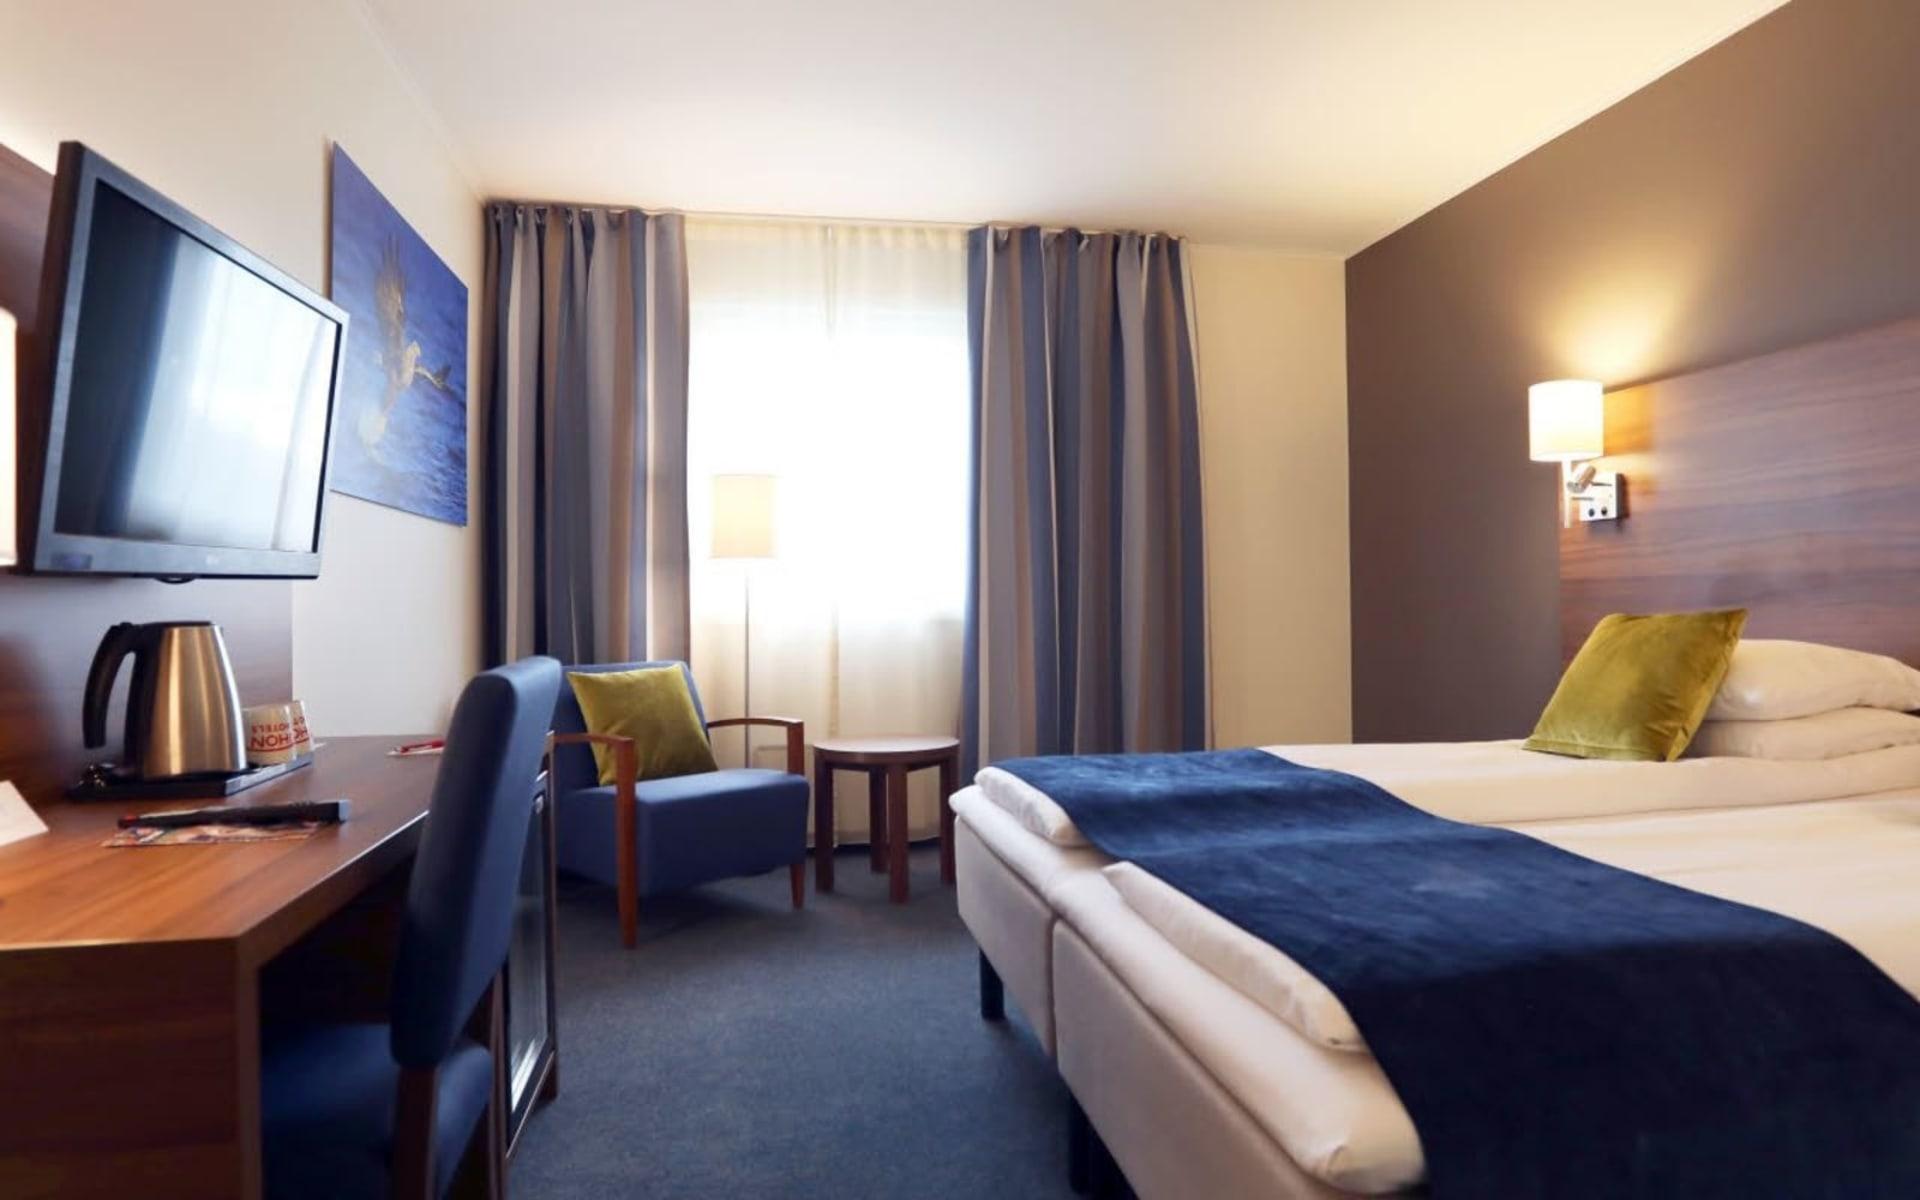 Thon Hotel Narvik: ©Thon Hotels_thon-hotel-narvik-standard-room-double-1